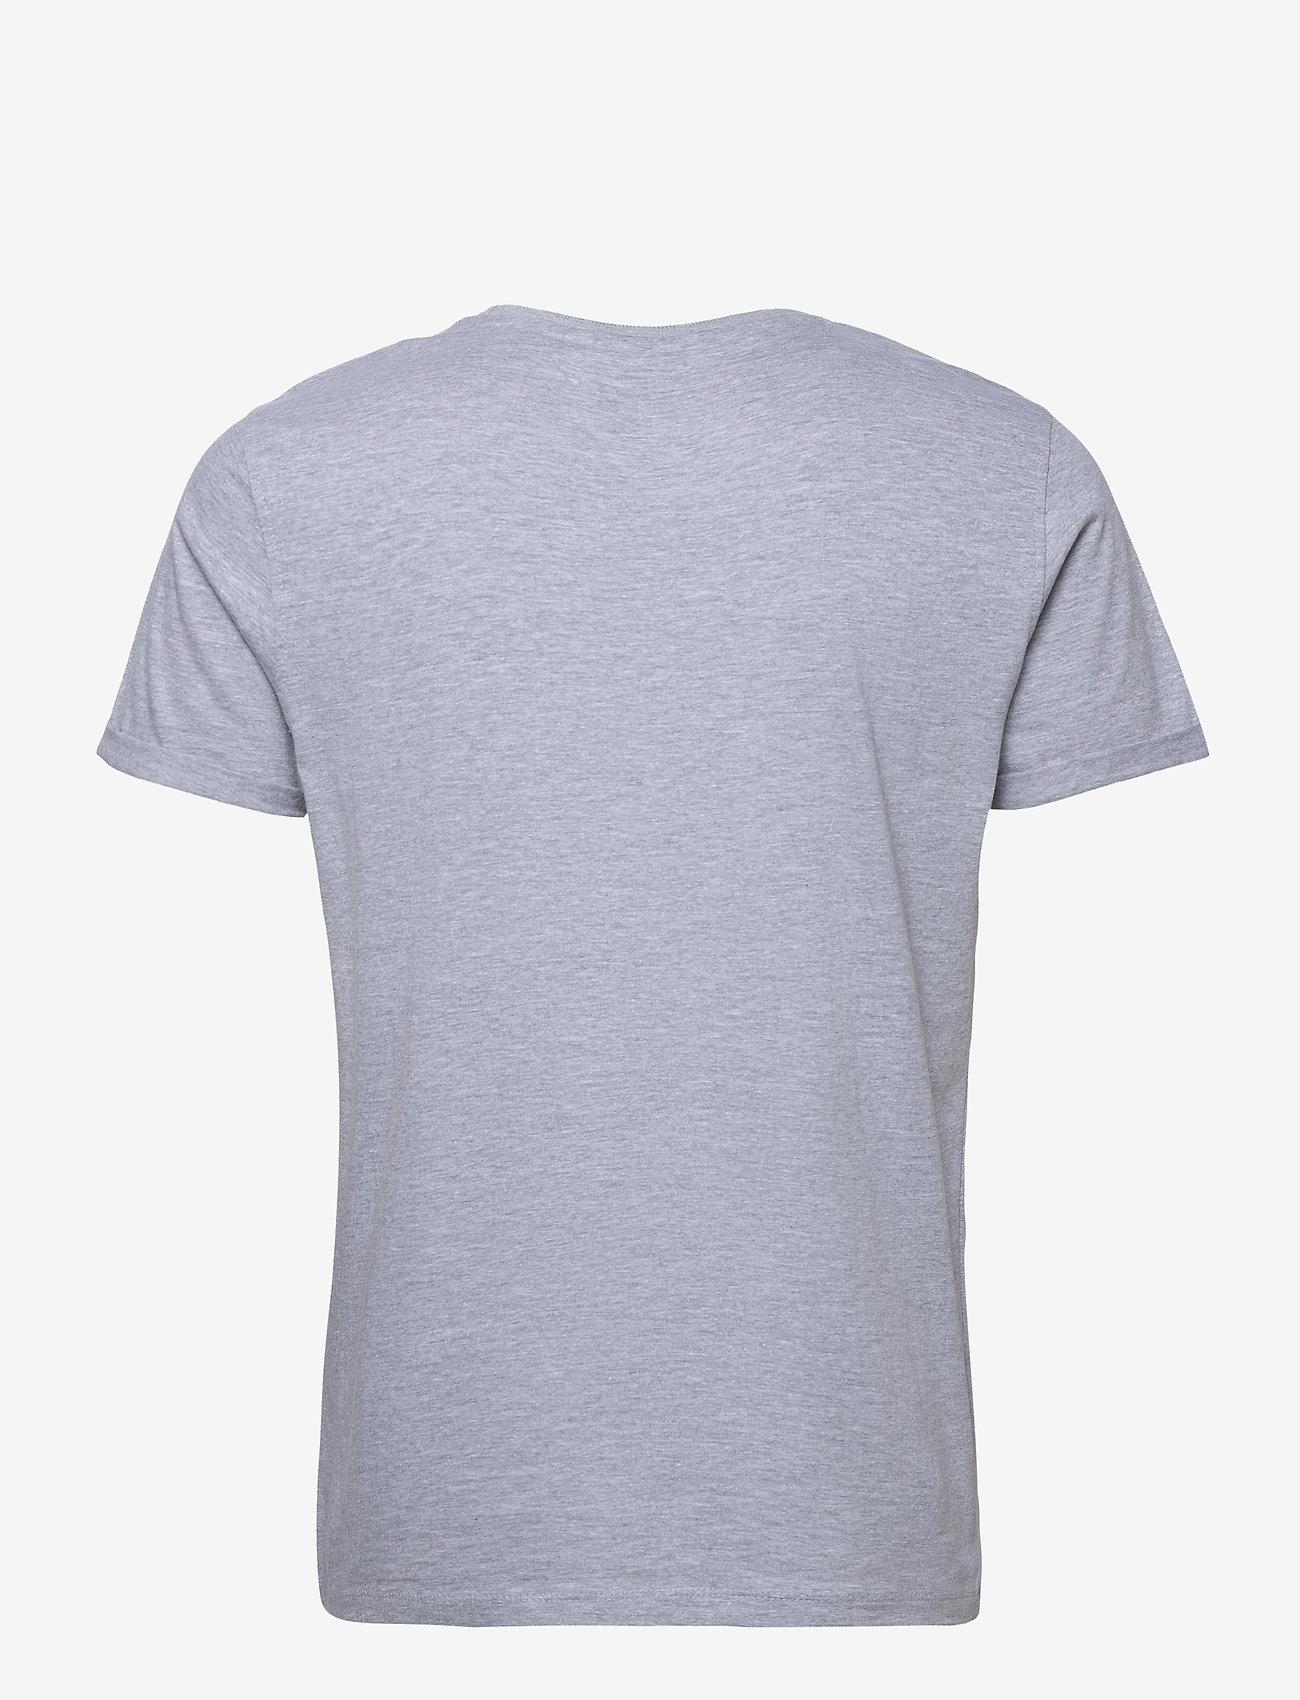 Blend - Tee - Organic - basic t-shirts - stone mix - 1